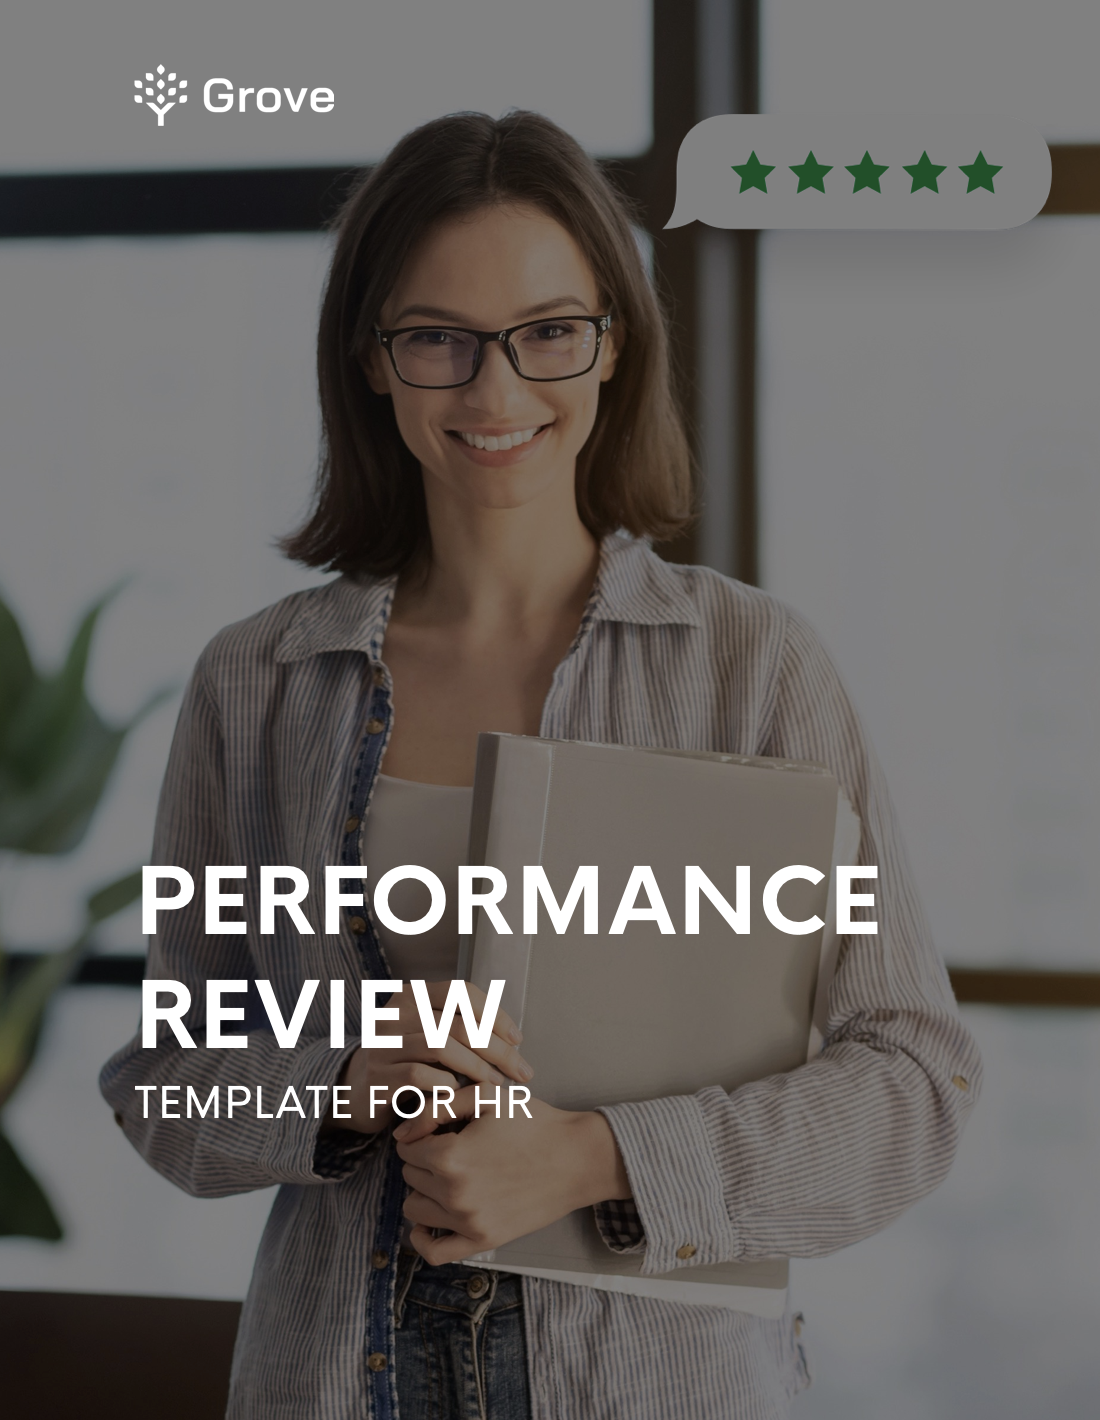 Grove HR - HR specialist performance review template slider 1